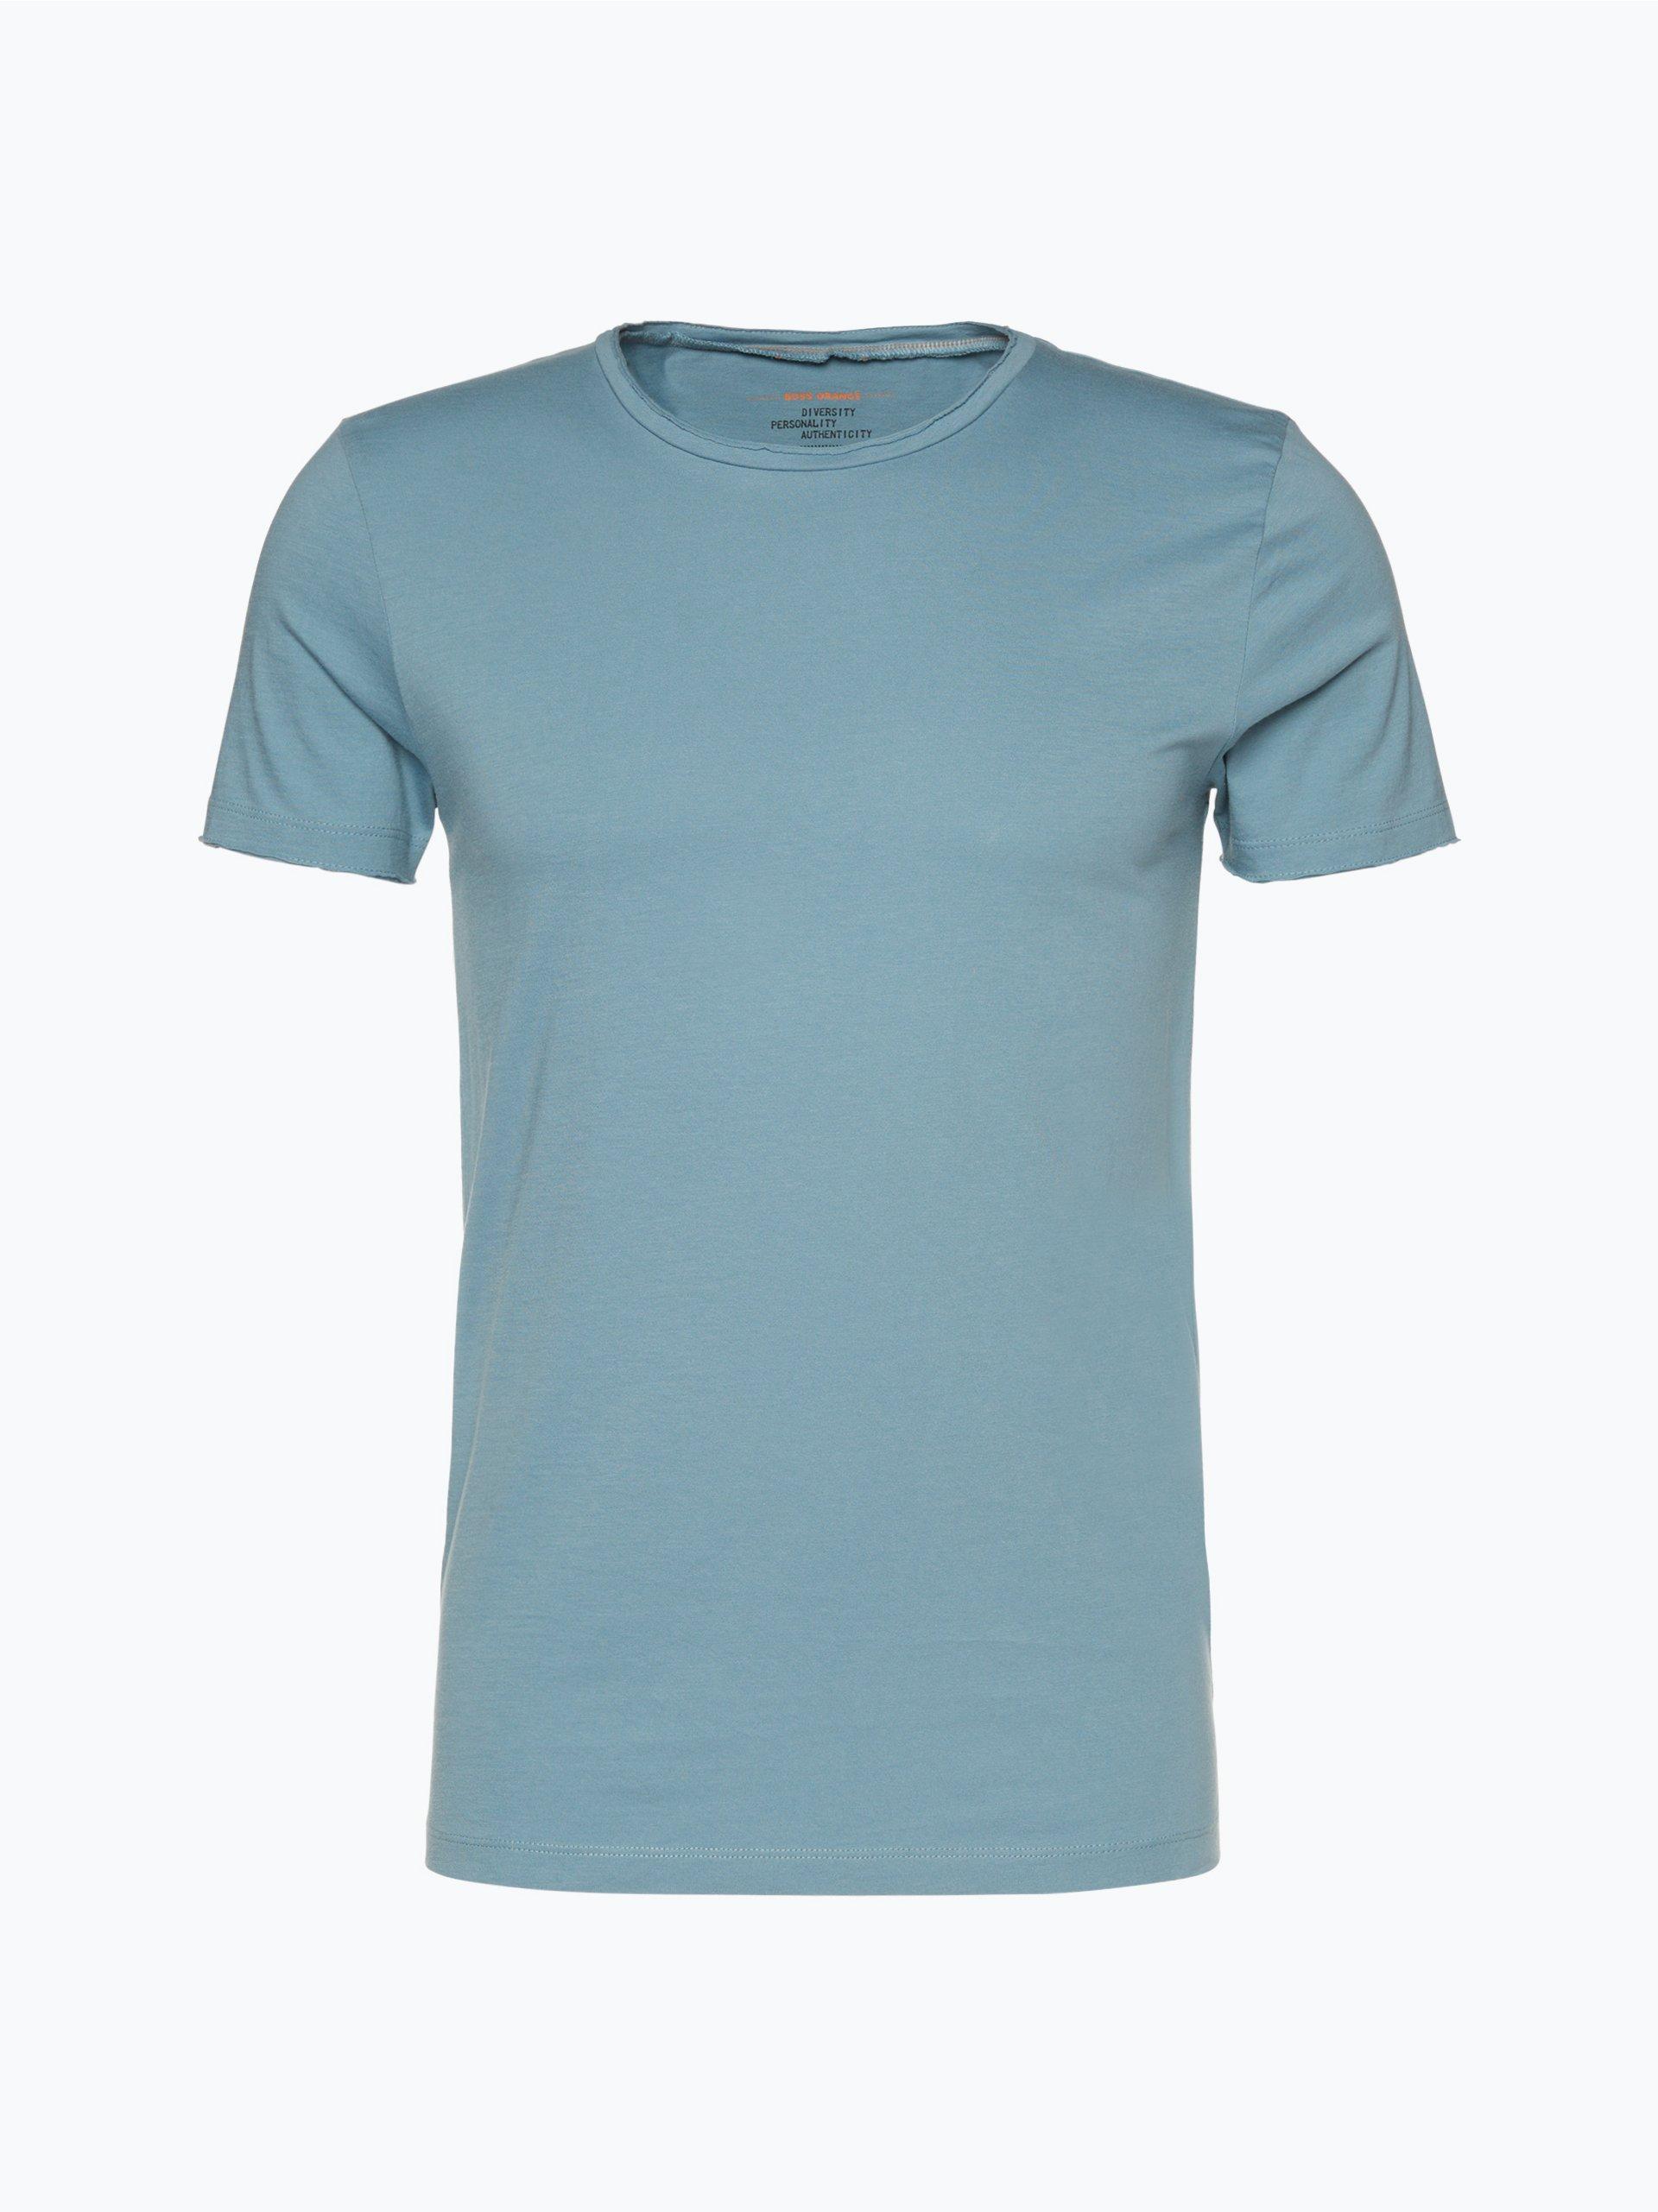 boss orange herren t shirt tooles aqua uni online kaufen. Black Bedroom Furniture Sets. Home Design Ideas